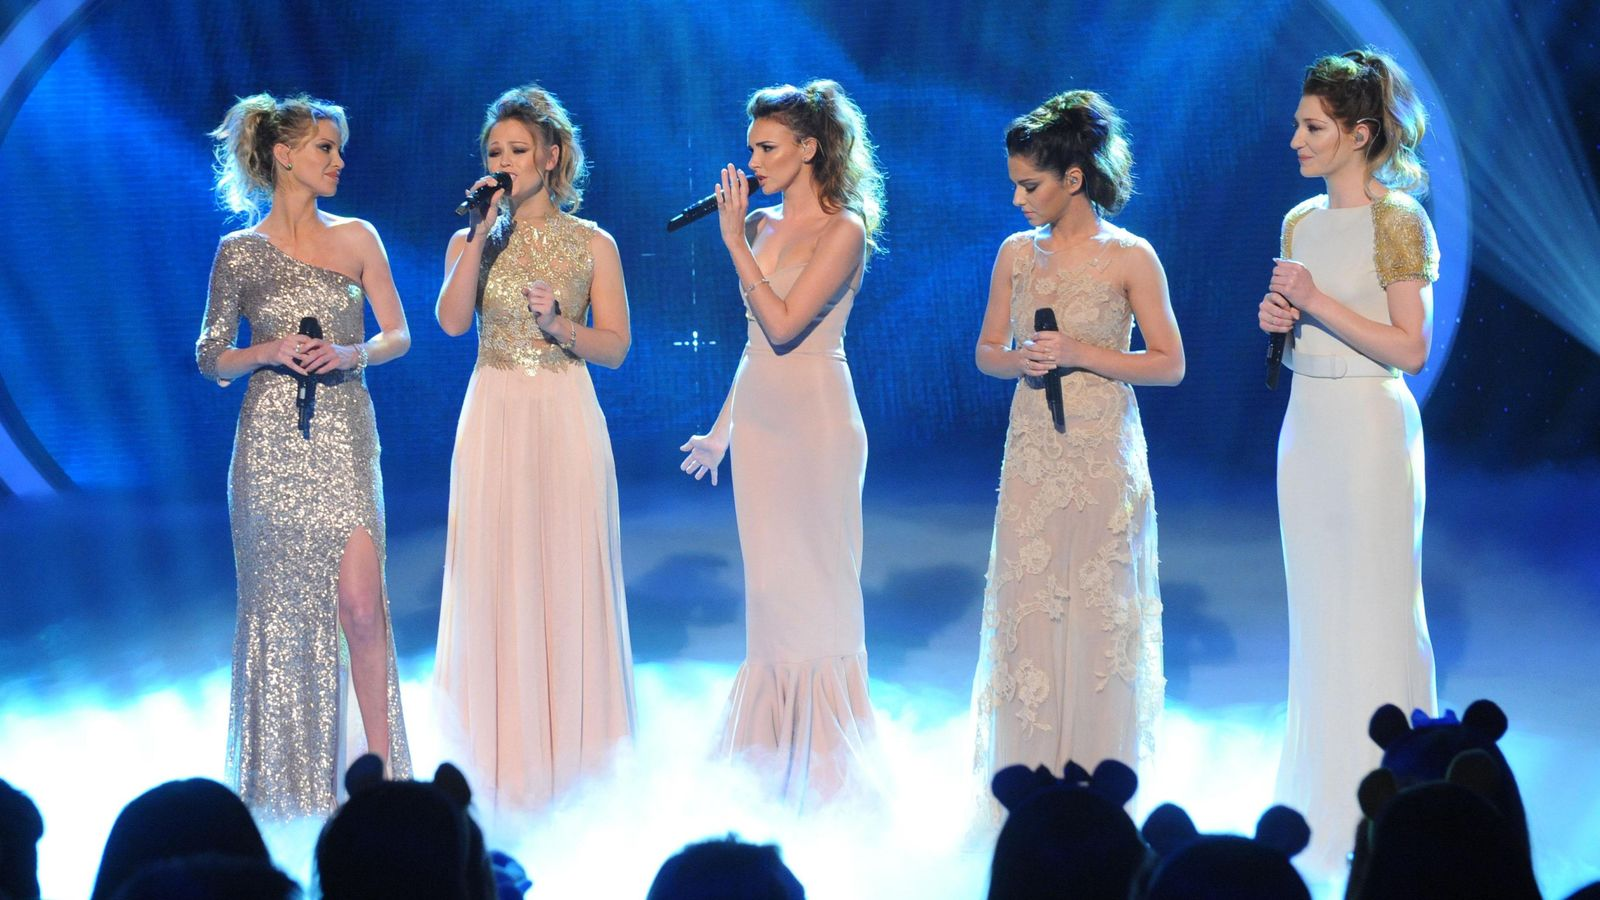 Sarah Harding dies: Nadine Coyle, Nicola Roberts and Geri Horner among stars paying tribute to singer